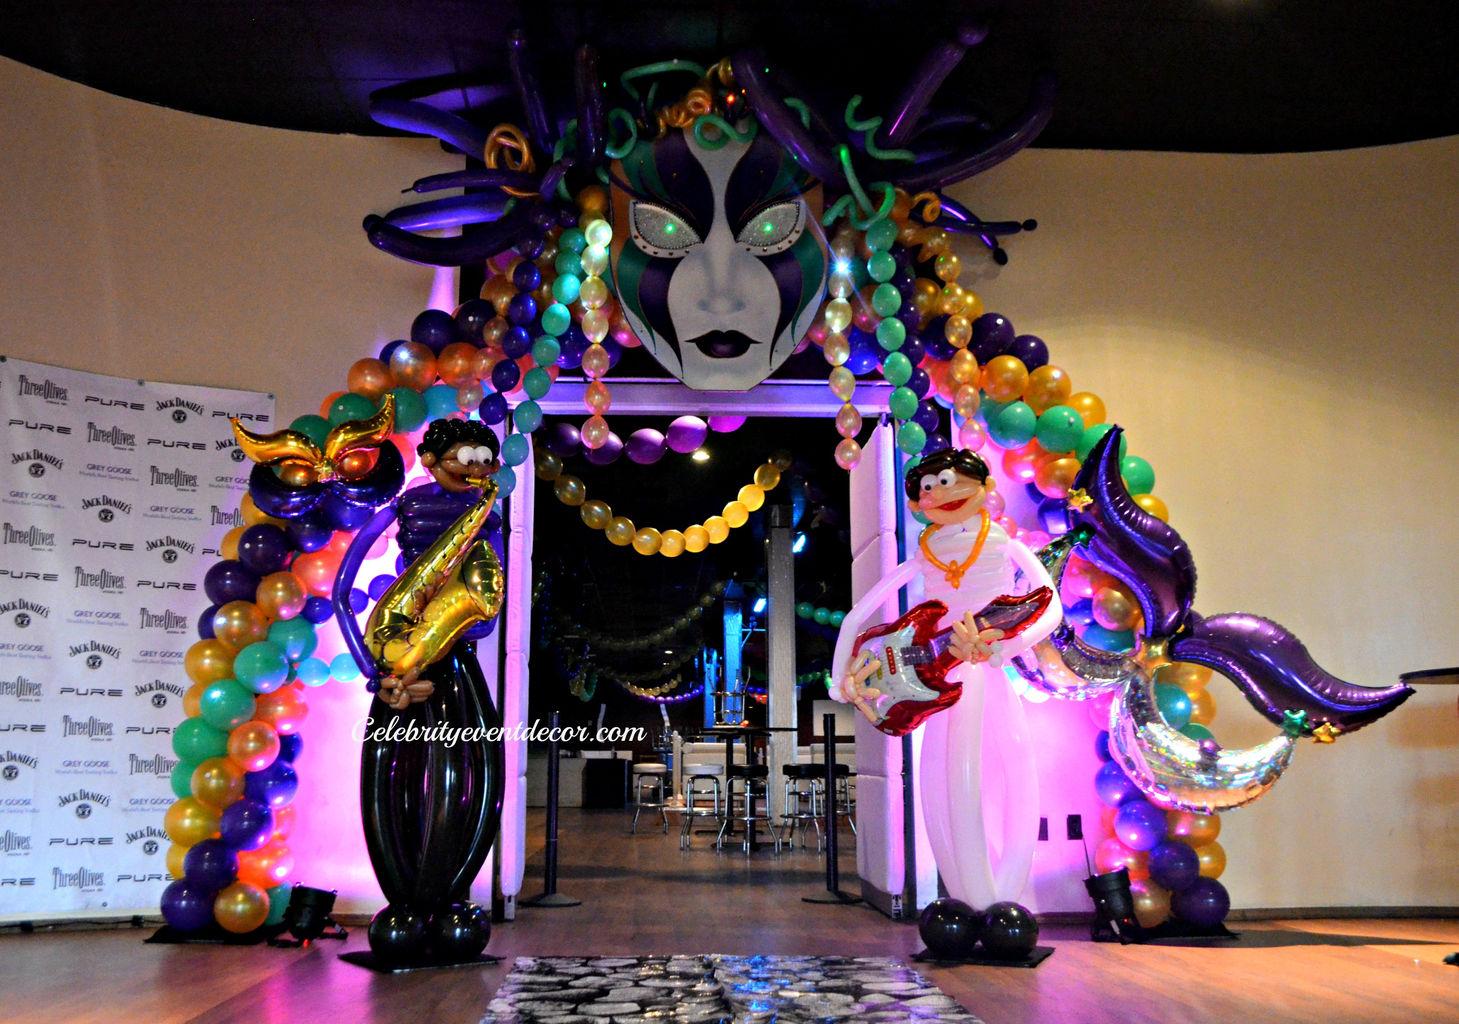 mardi gras balloon decorationsjpg - Event Decorations